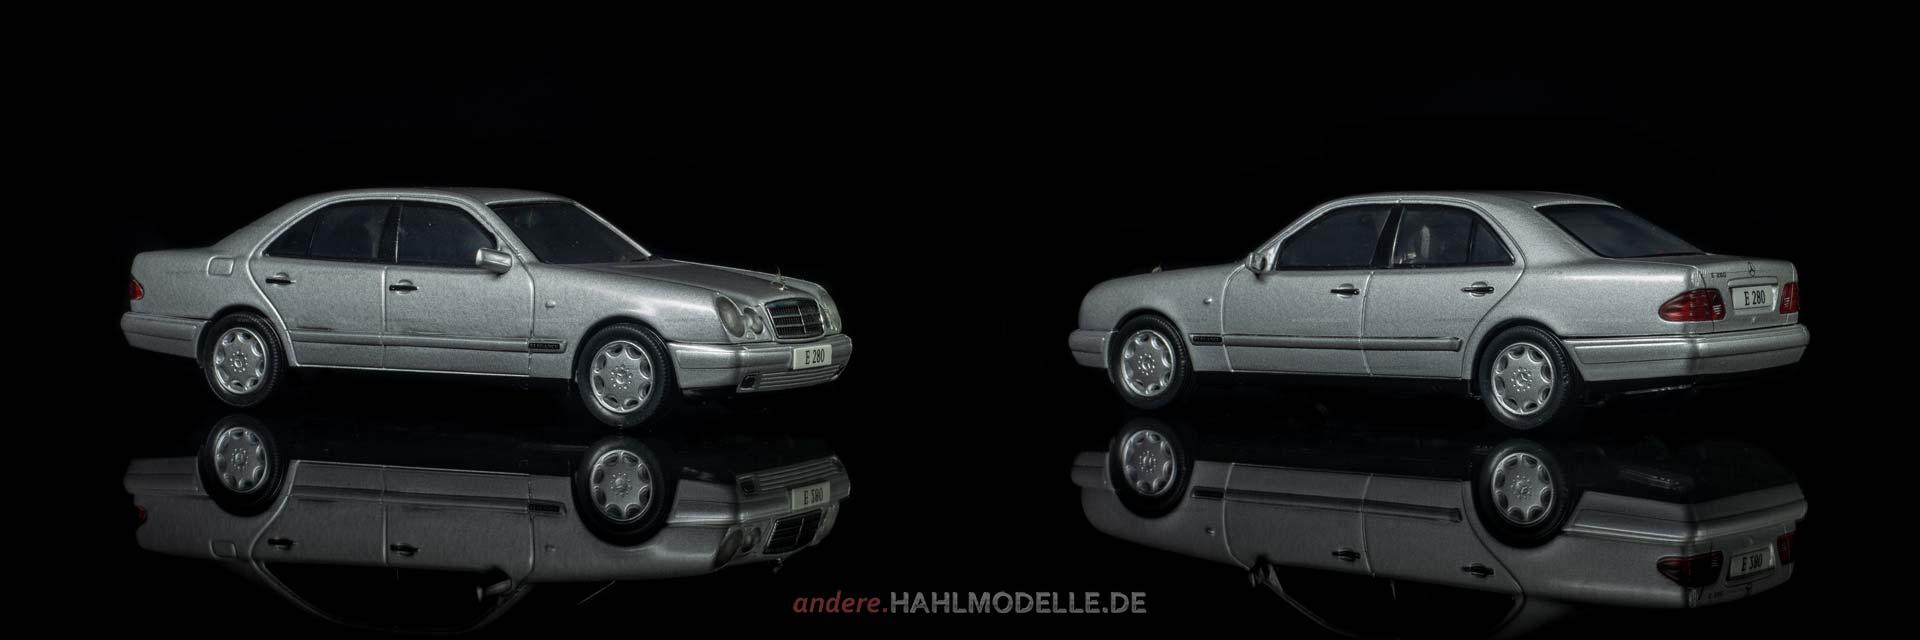 Mercedes-Benz E 280 (W 210 | Limousine | Herpa | www.andere.hahlmodelle.de